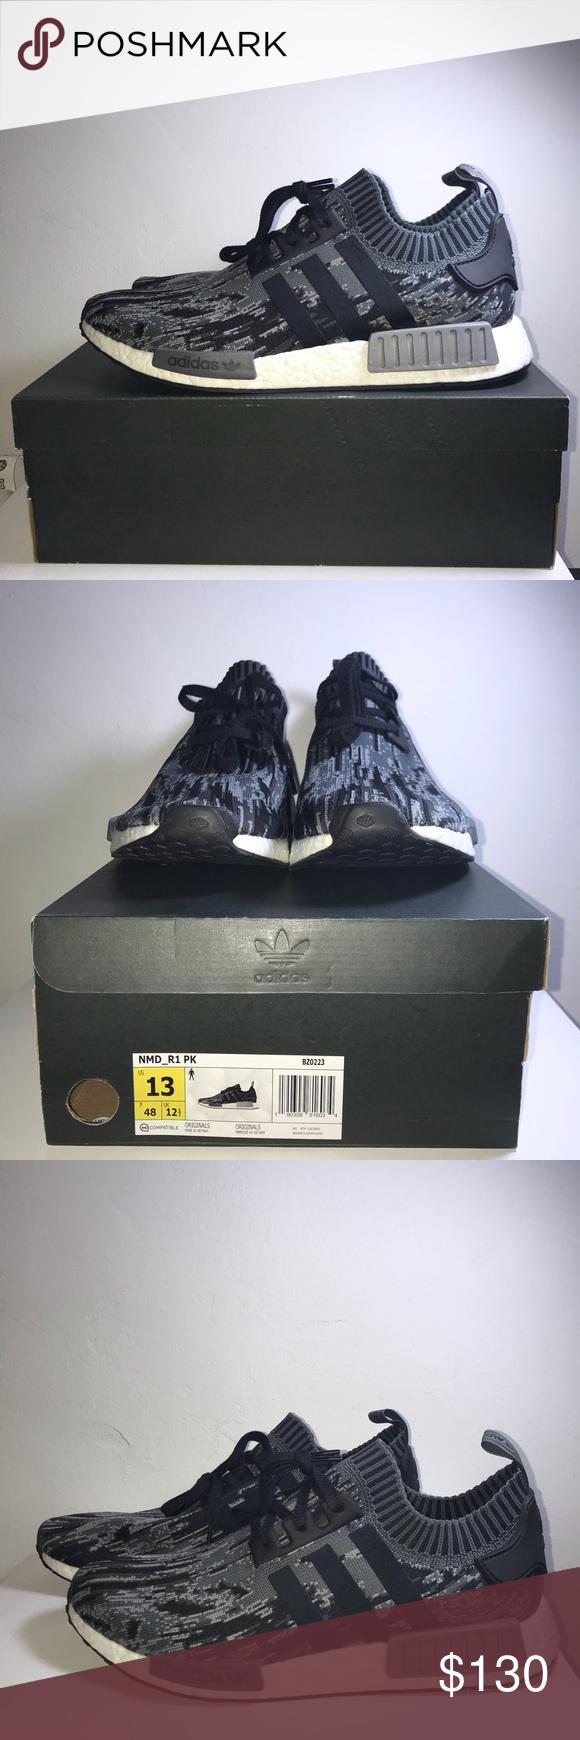 "2a9272c18 Adidas NMD R1 PK ""Grey Three"" Glitch Camo Sneaker 100% Authentic New With  Box"